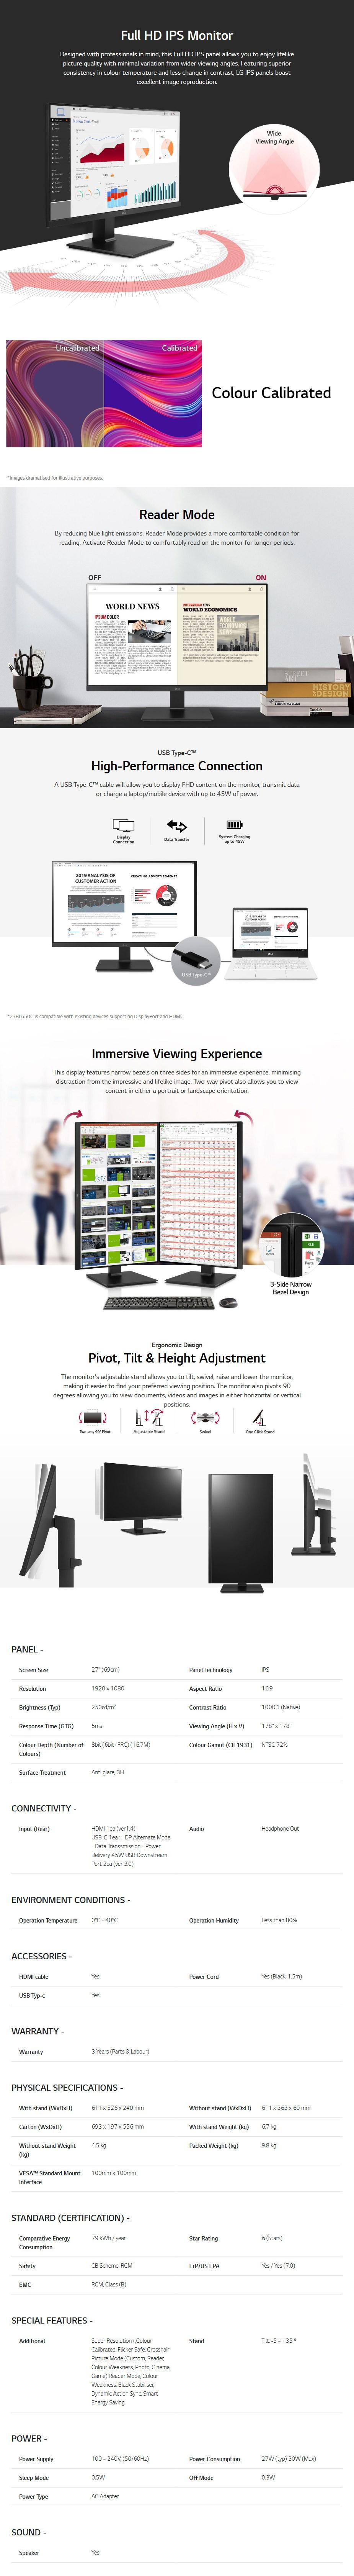 lg-27bl650cb-27-full-hd-usbc-calibrated-ergonomic-ips-monitor-ac35671-6.jpg